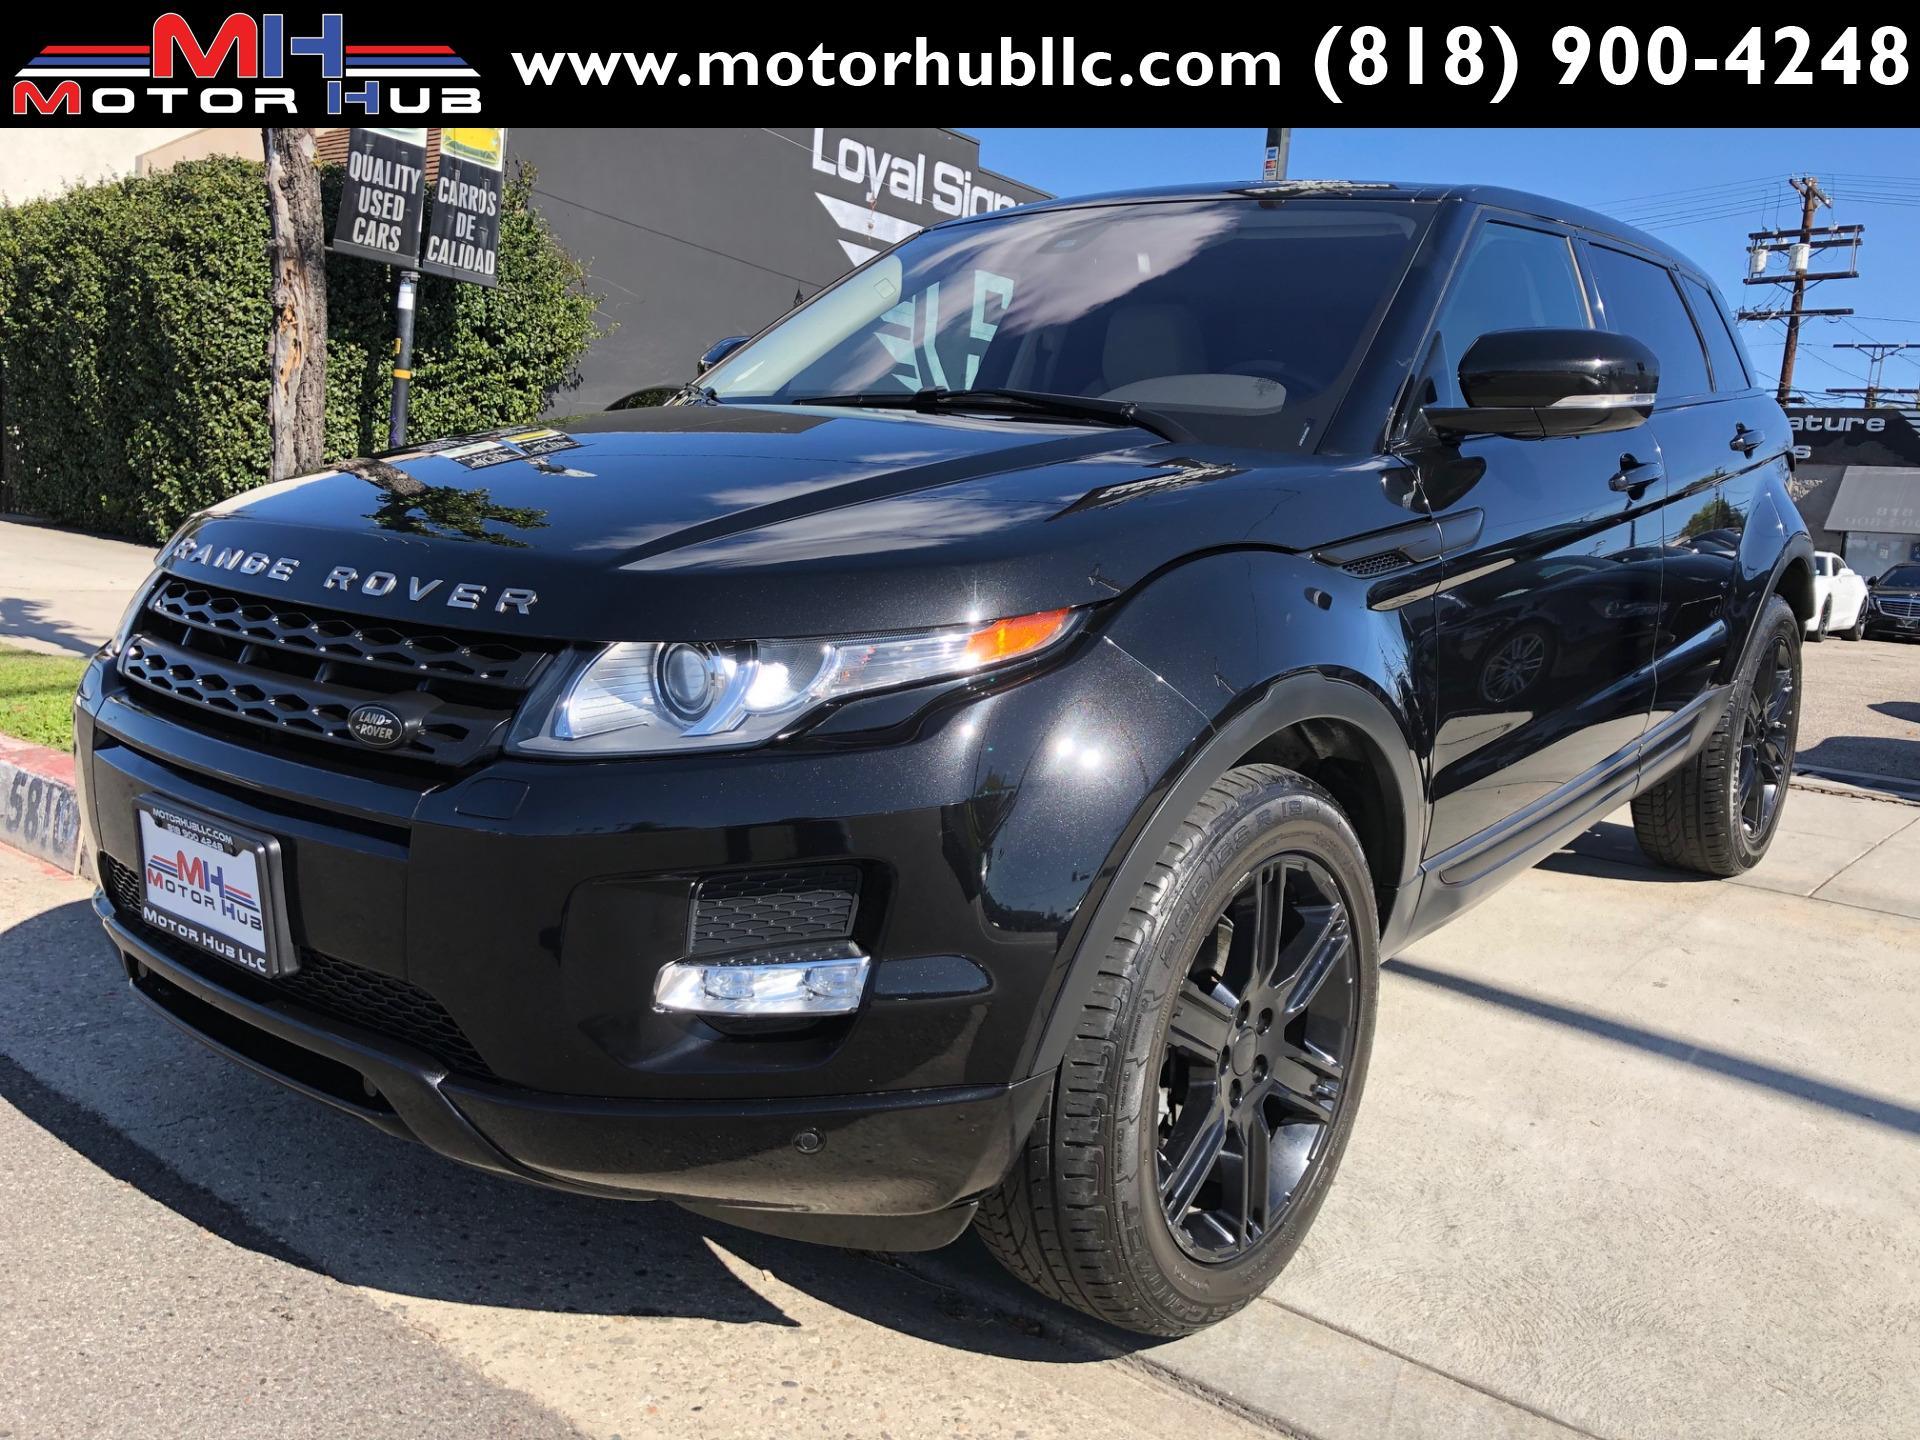 2013 Land Rover Range Rover Evoque Pure Plus Stock 826940 For Sale Near Van Nuys Ca Ca Land Rover Dealer